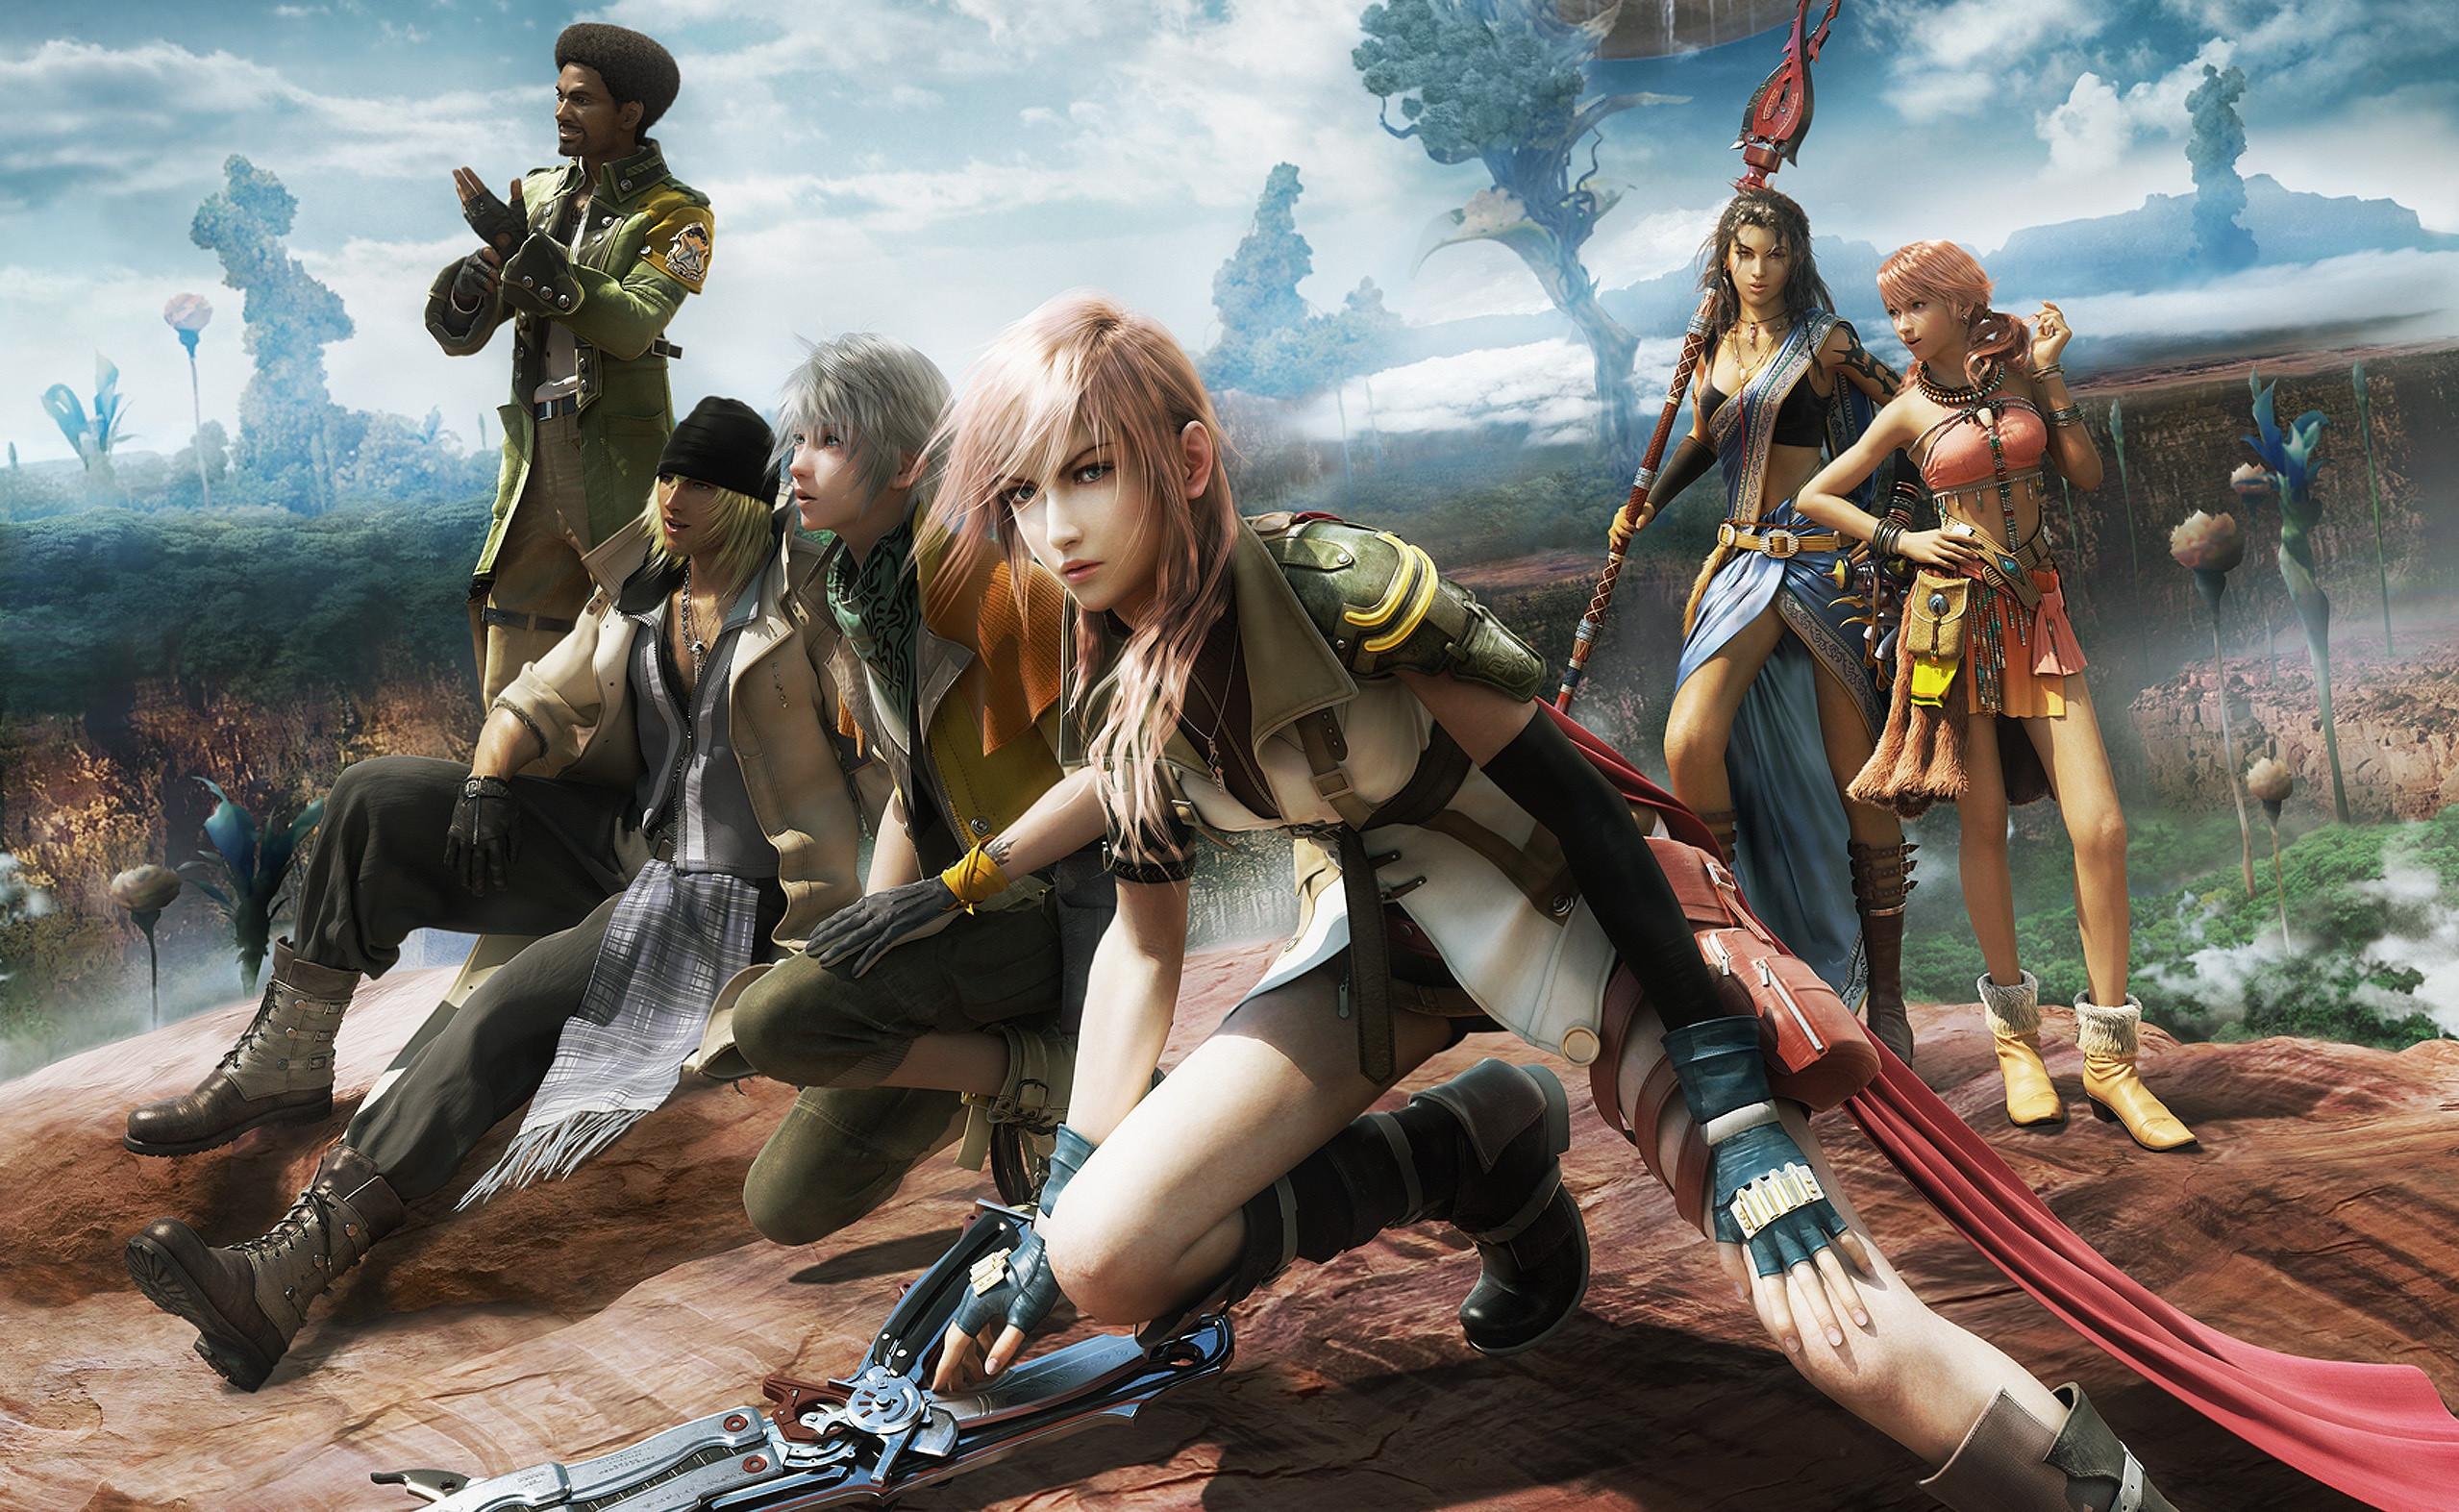 Final Fantasy 13 Wallpaper Hd Wallpapertag